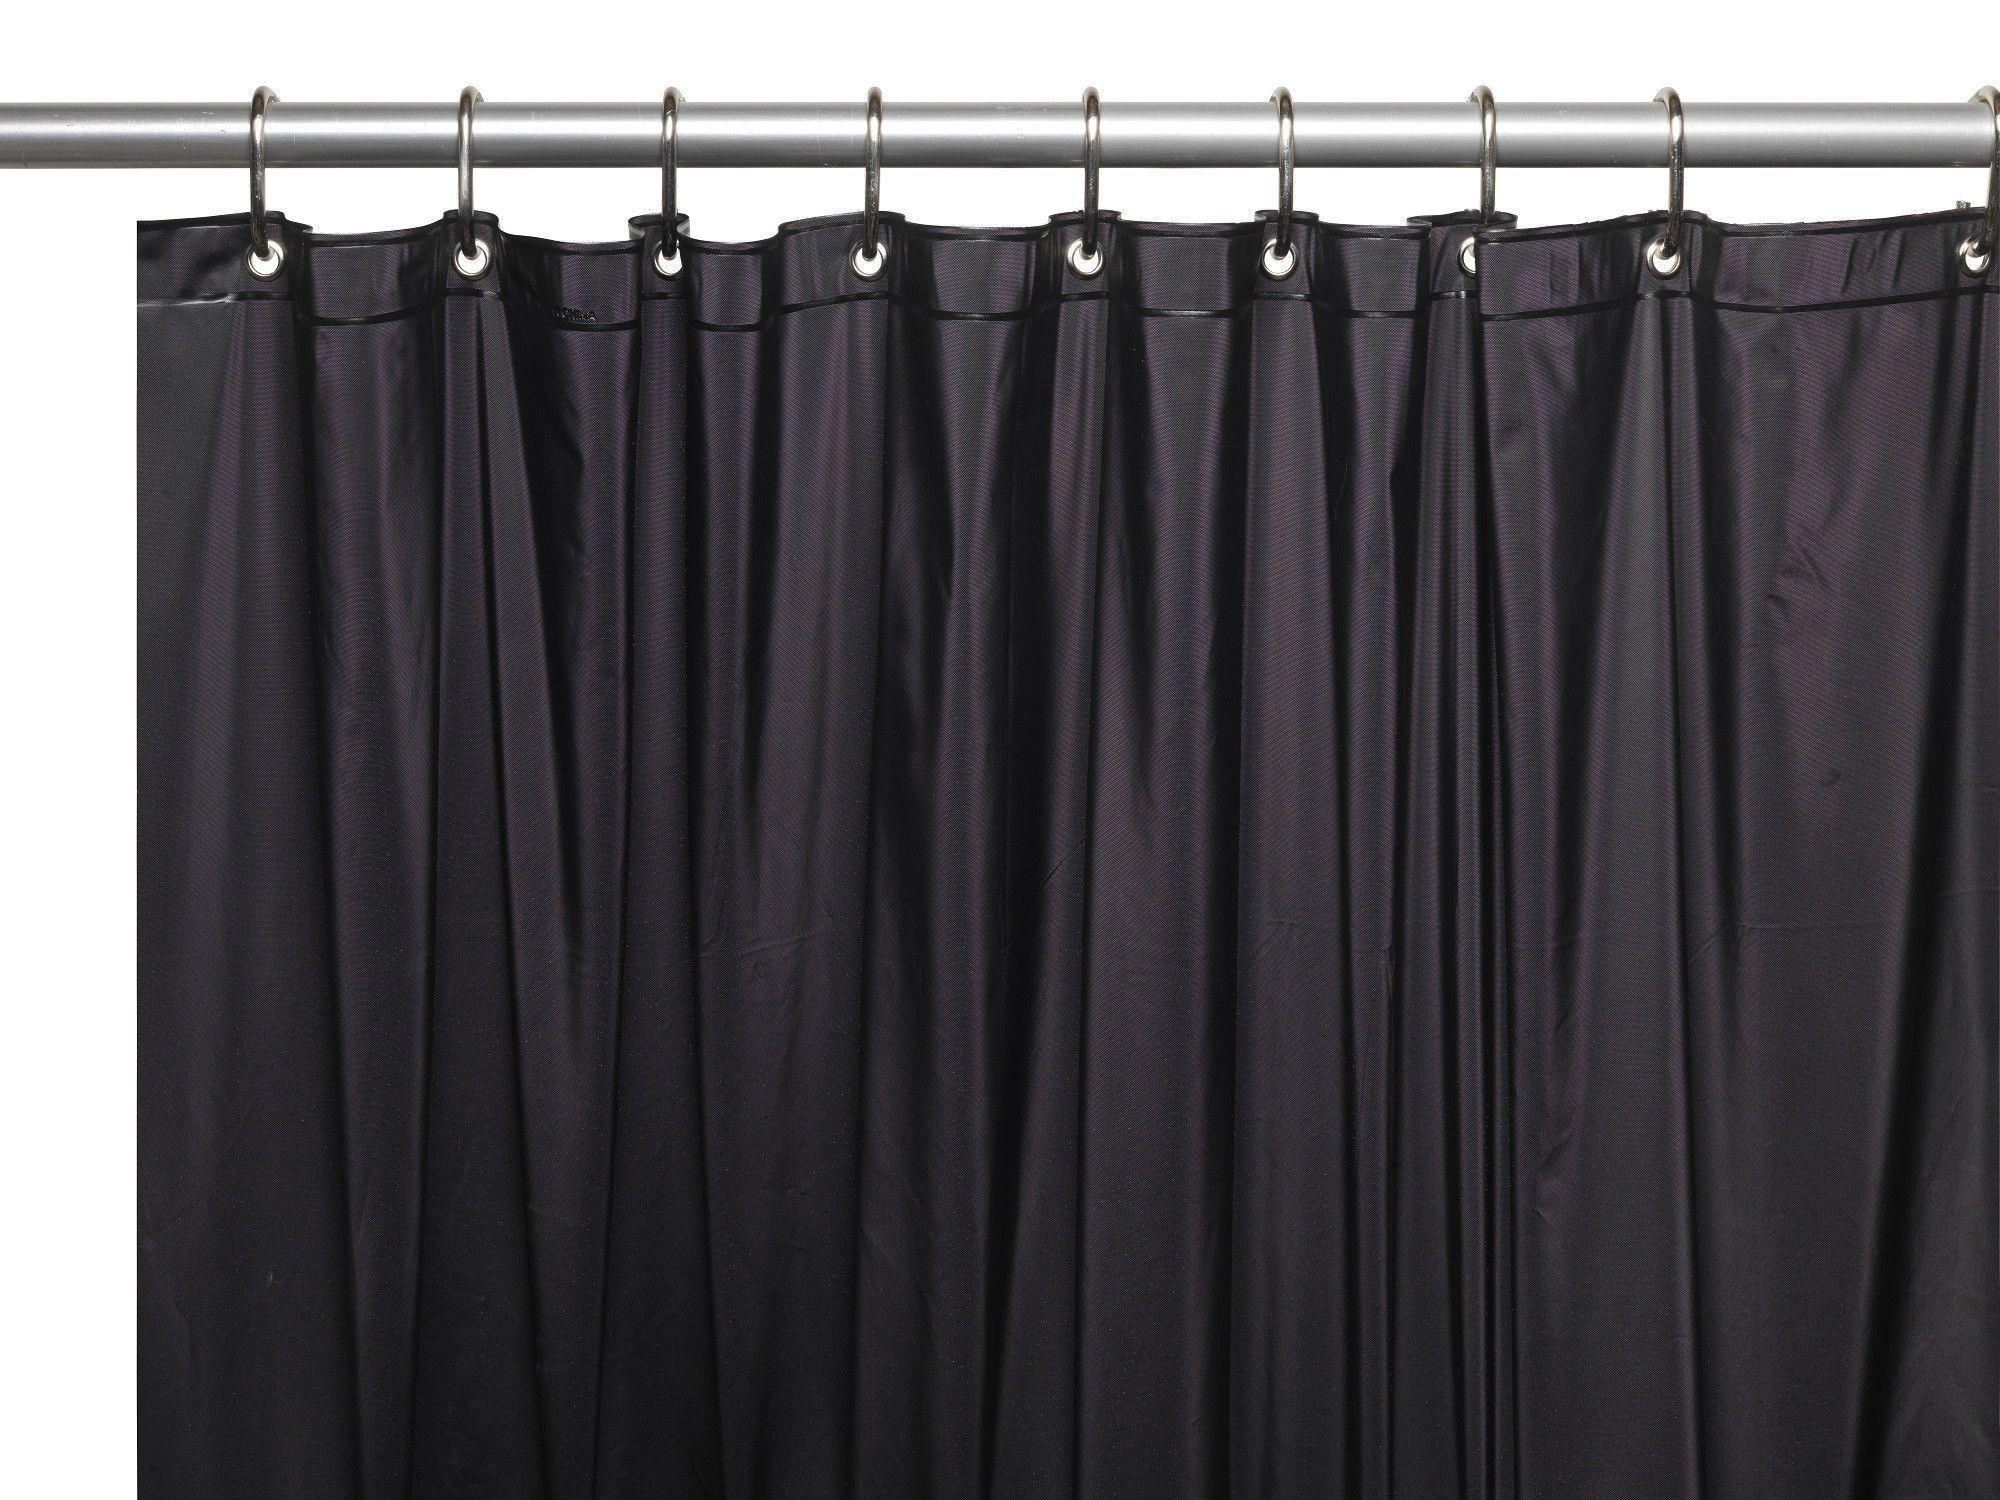 Royal Bath Extra Wide 5 Gauge Vinyl Shower Curtain Liner With Metal Grommets In Black Size 72